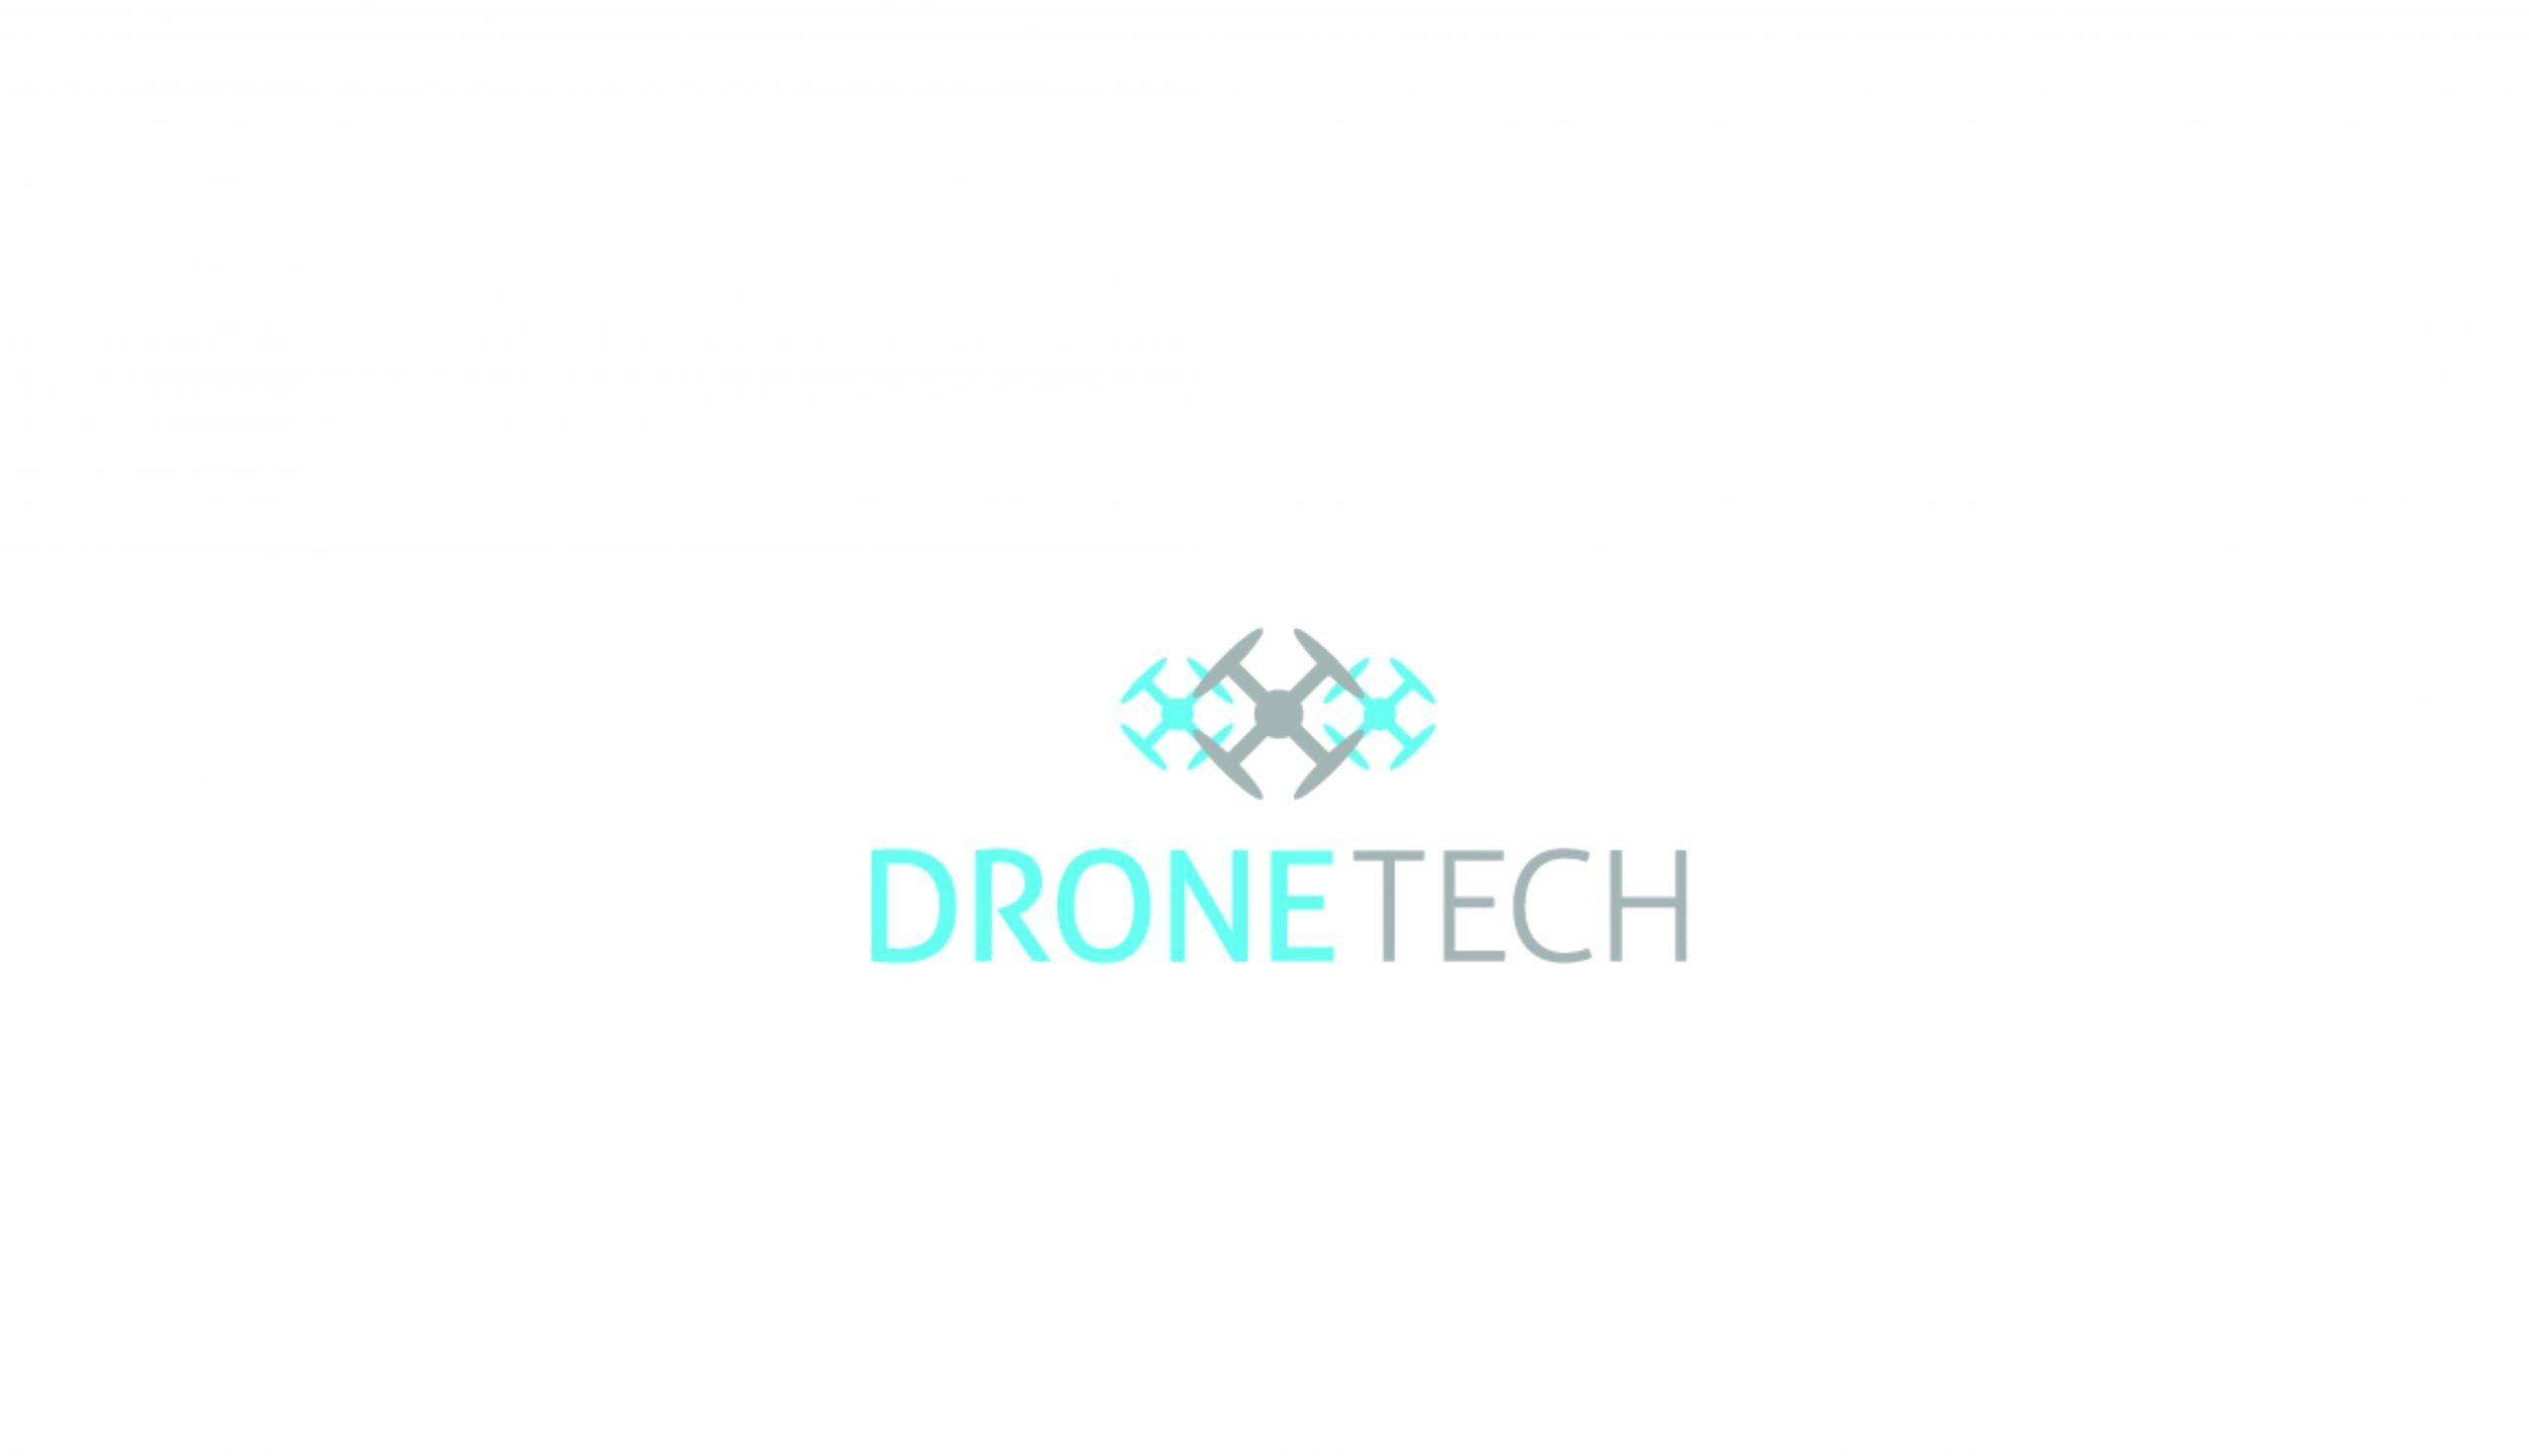 IBlockFIRE na targach dronów w Toruniu – 18-19.10.2019 r.